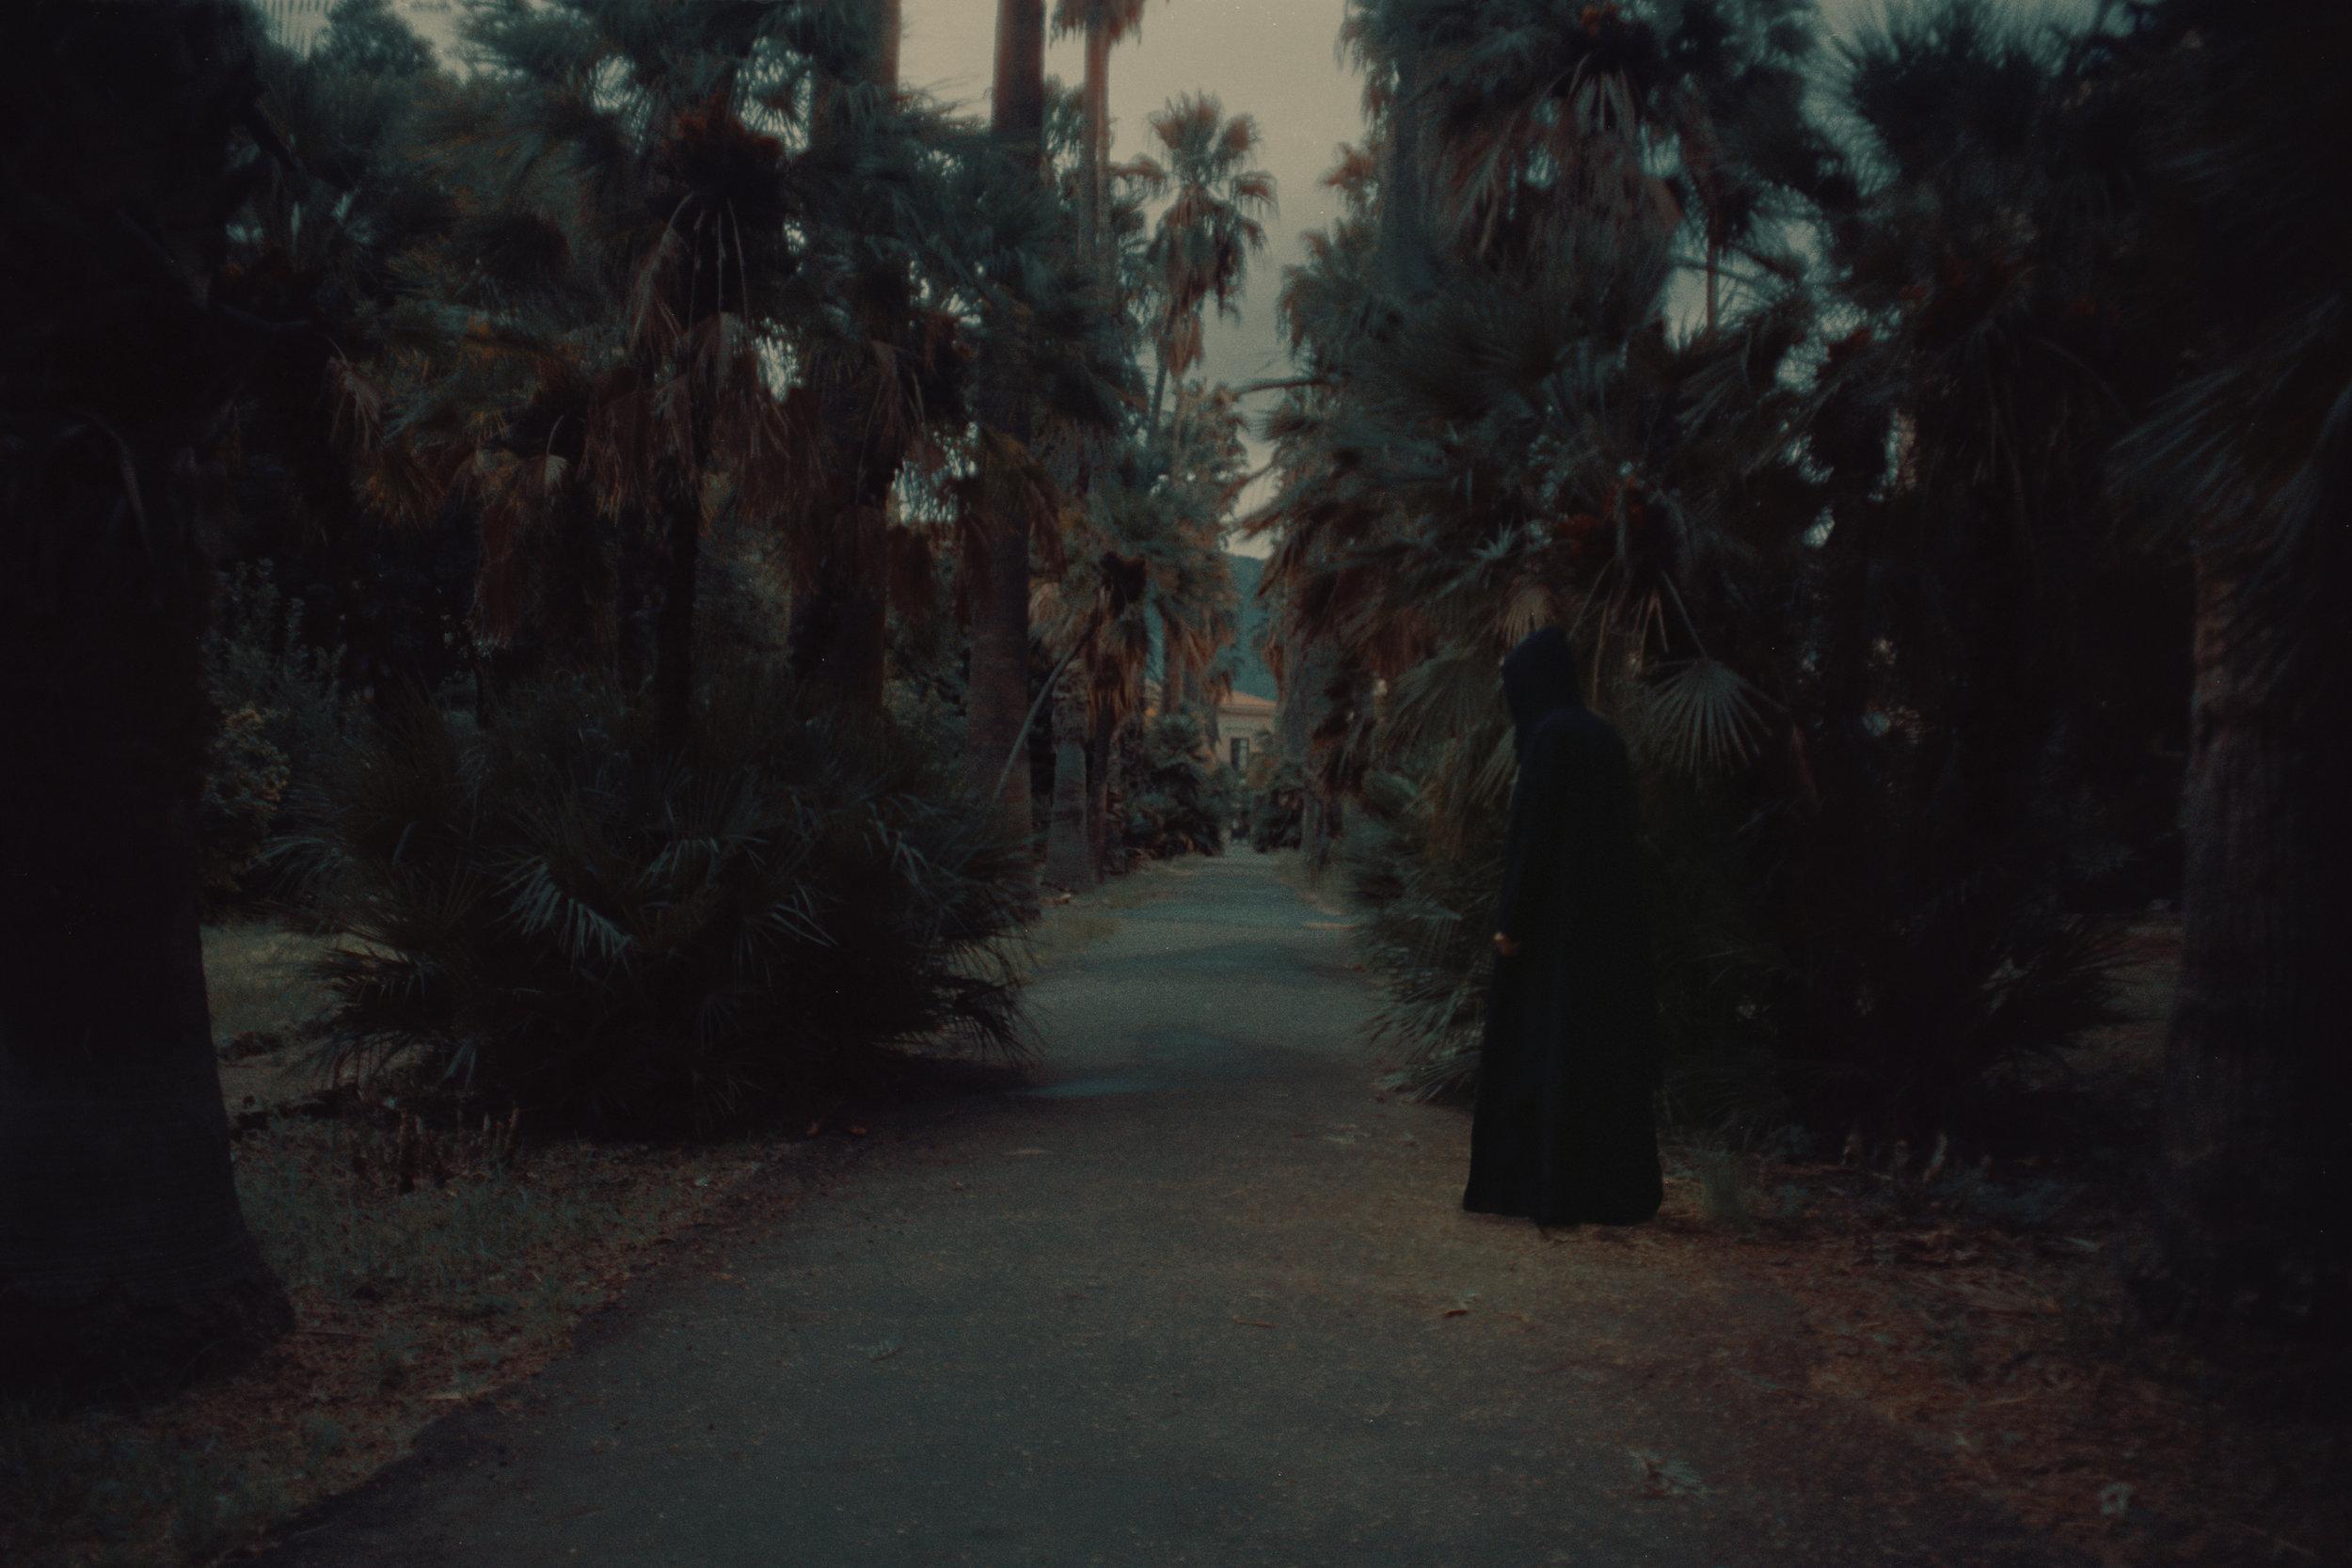 35mm  2018